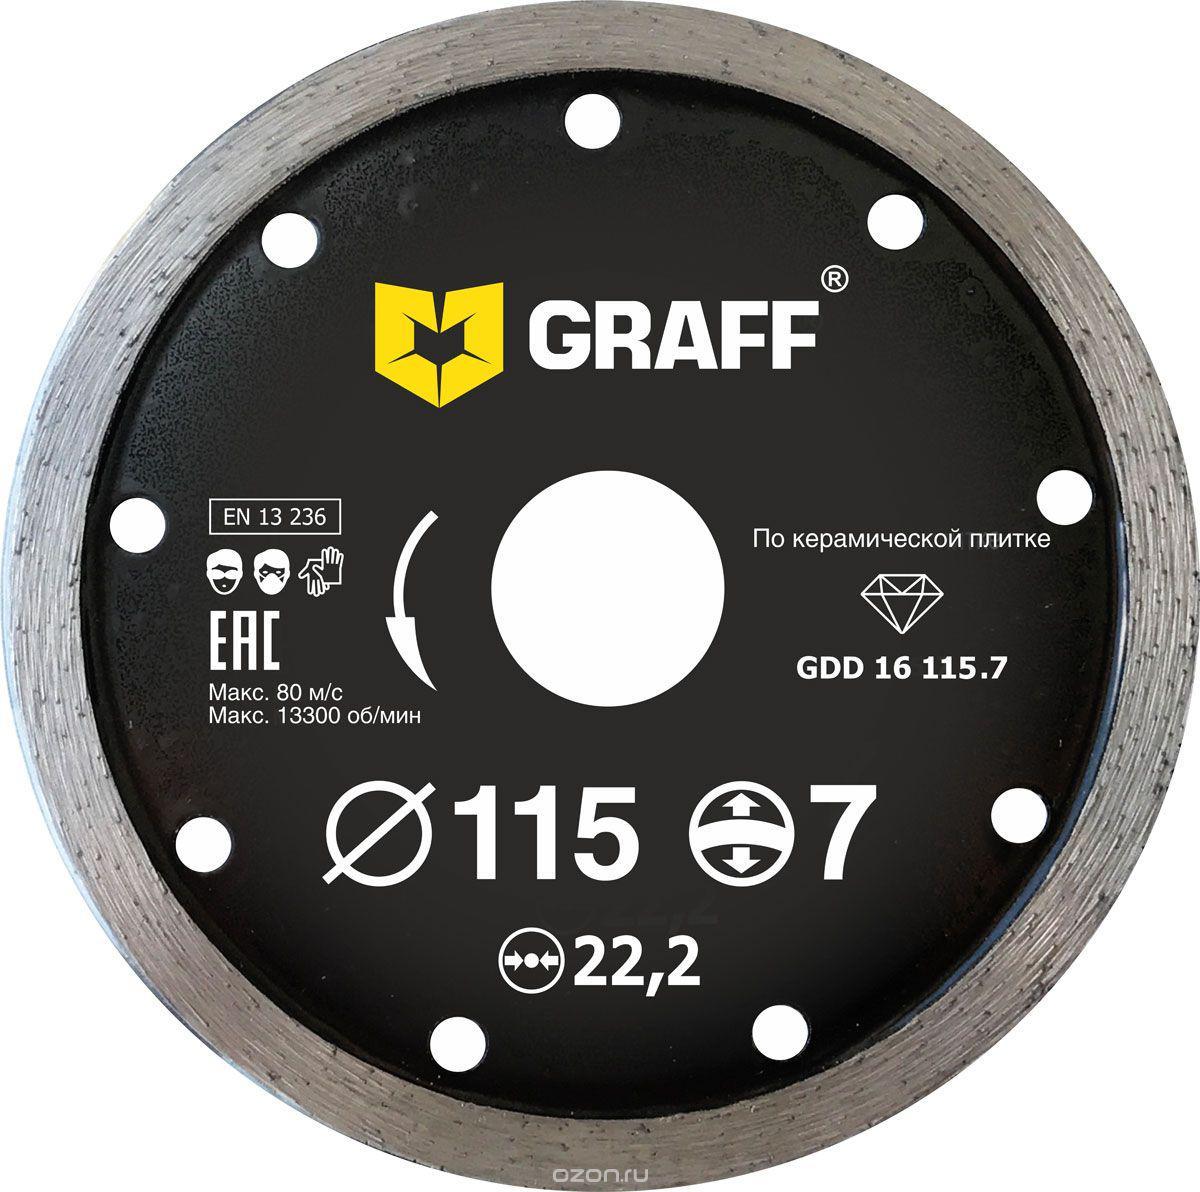 Картинка для Круг алмазный Graff Graff gdd 16 115.7